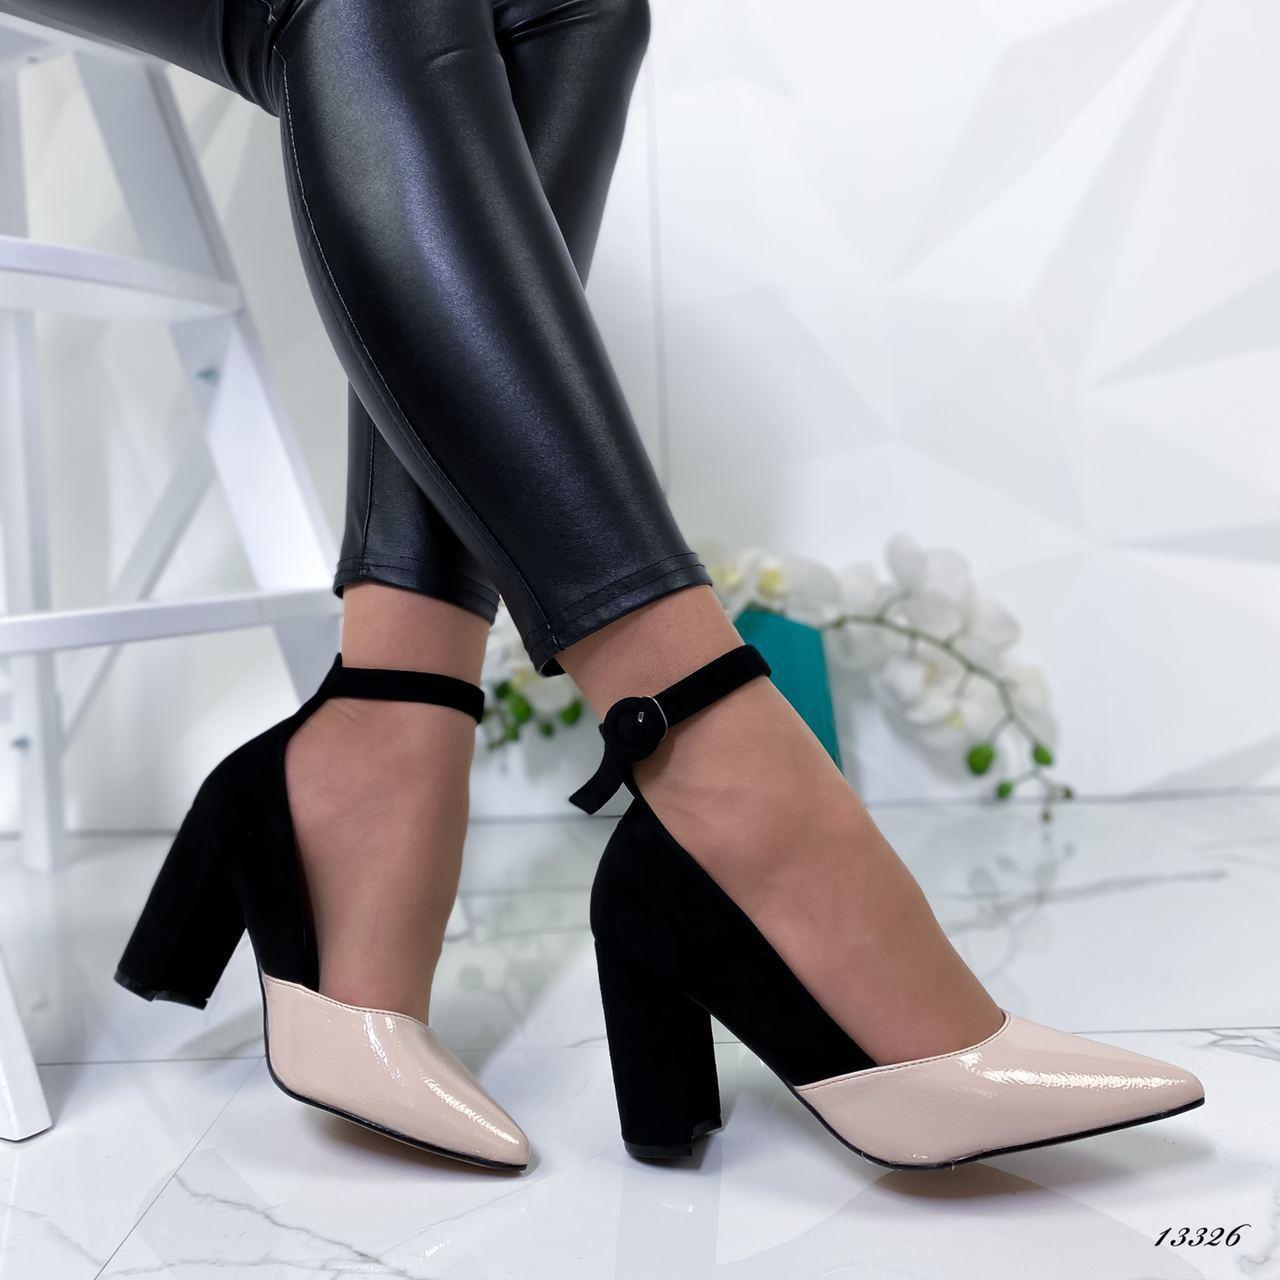 Женские туфли на каблуке из эко-замши чёрно-бежевые